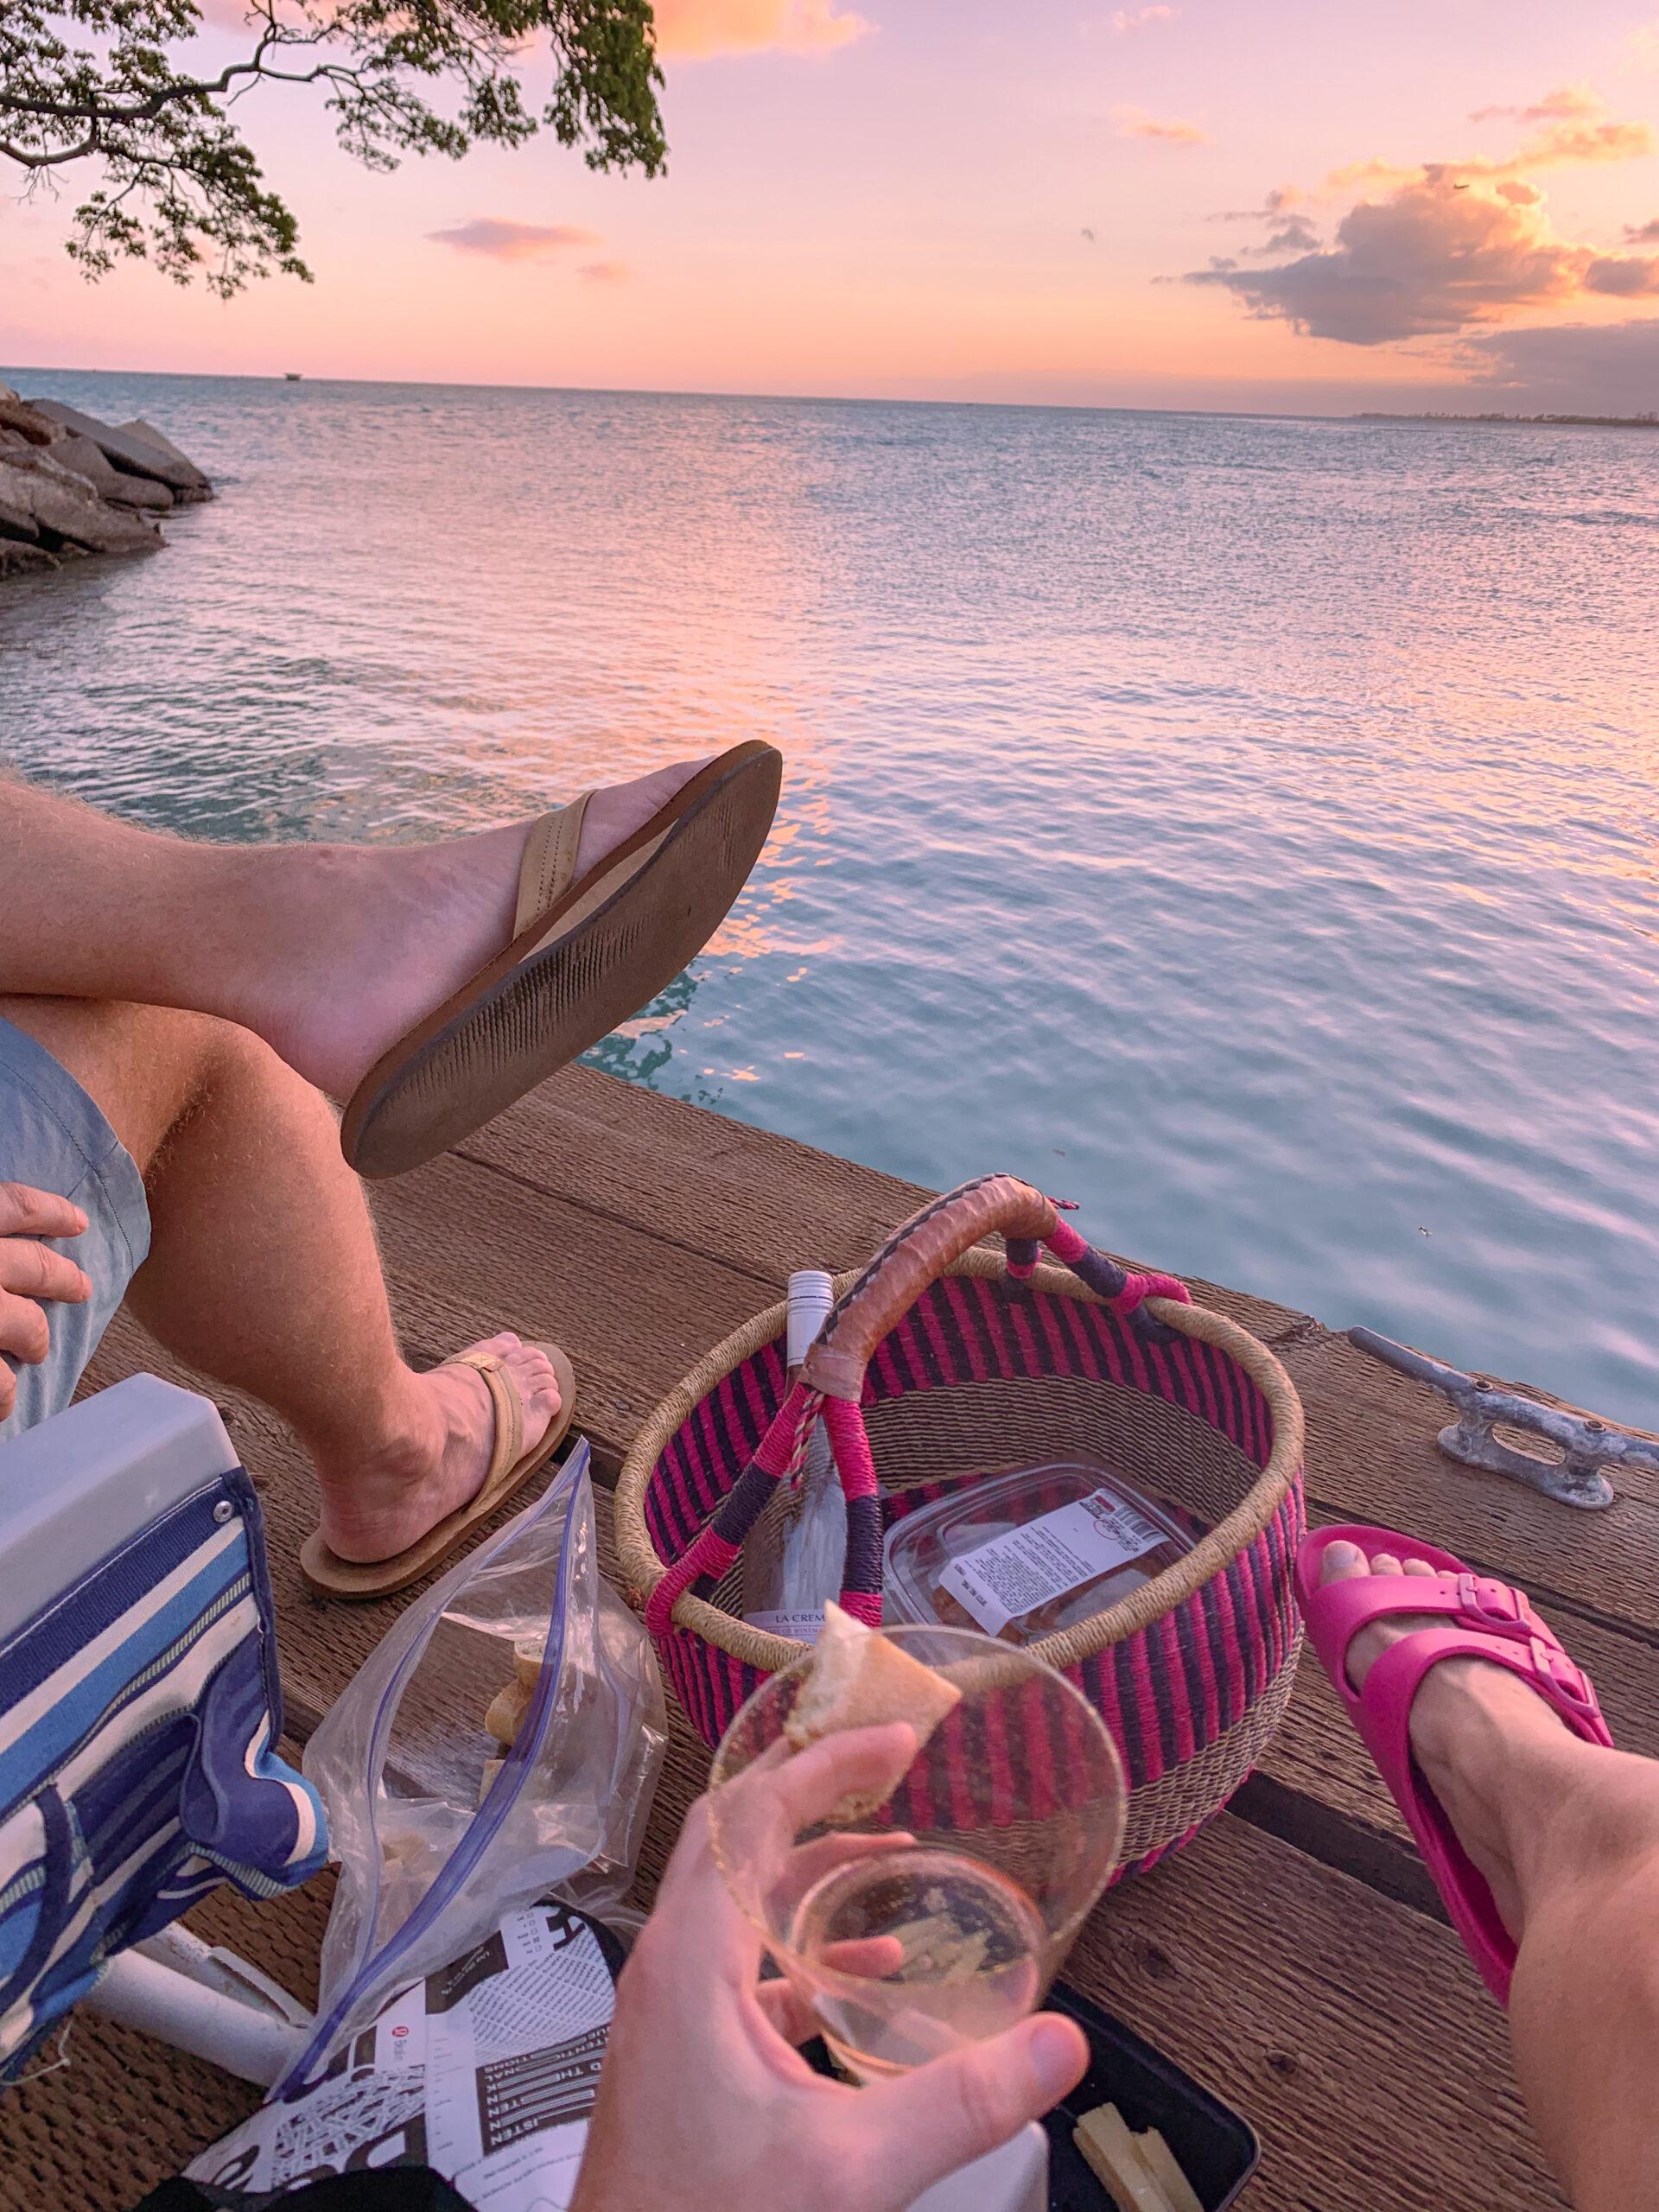 Hawaii sunset picnic